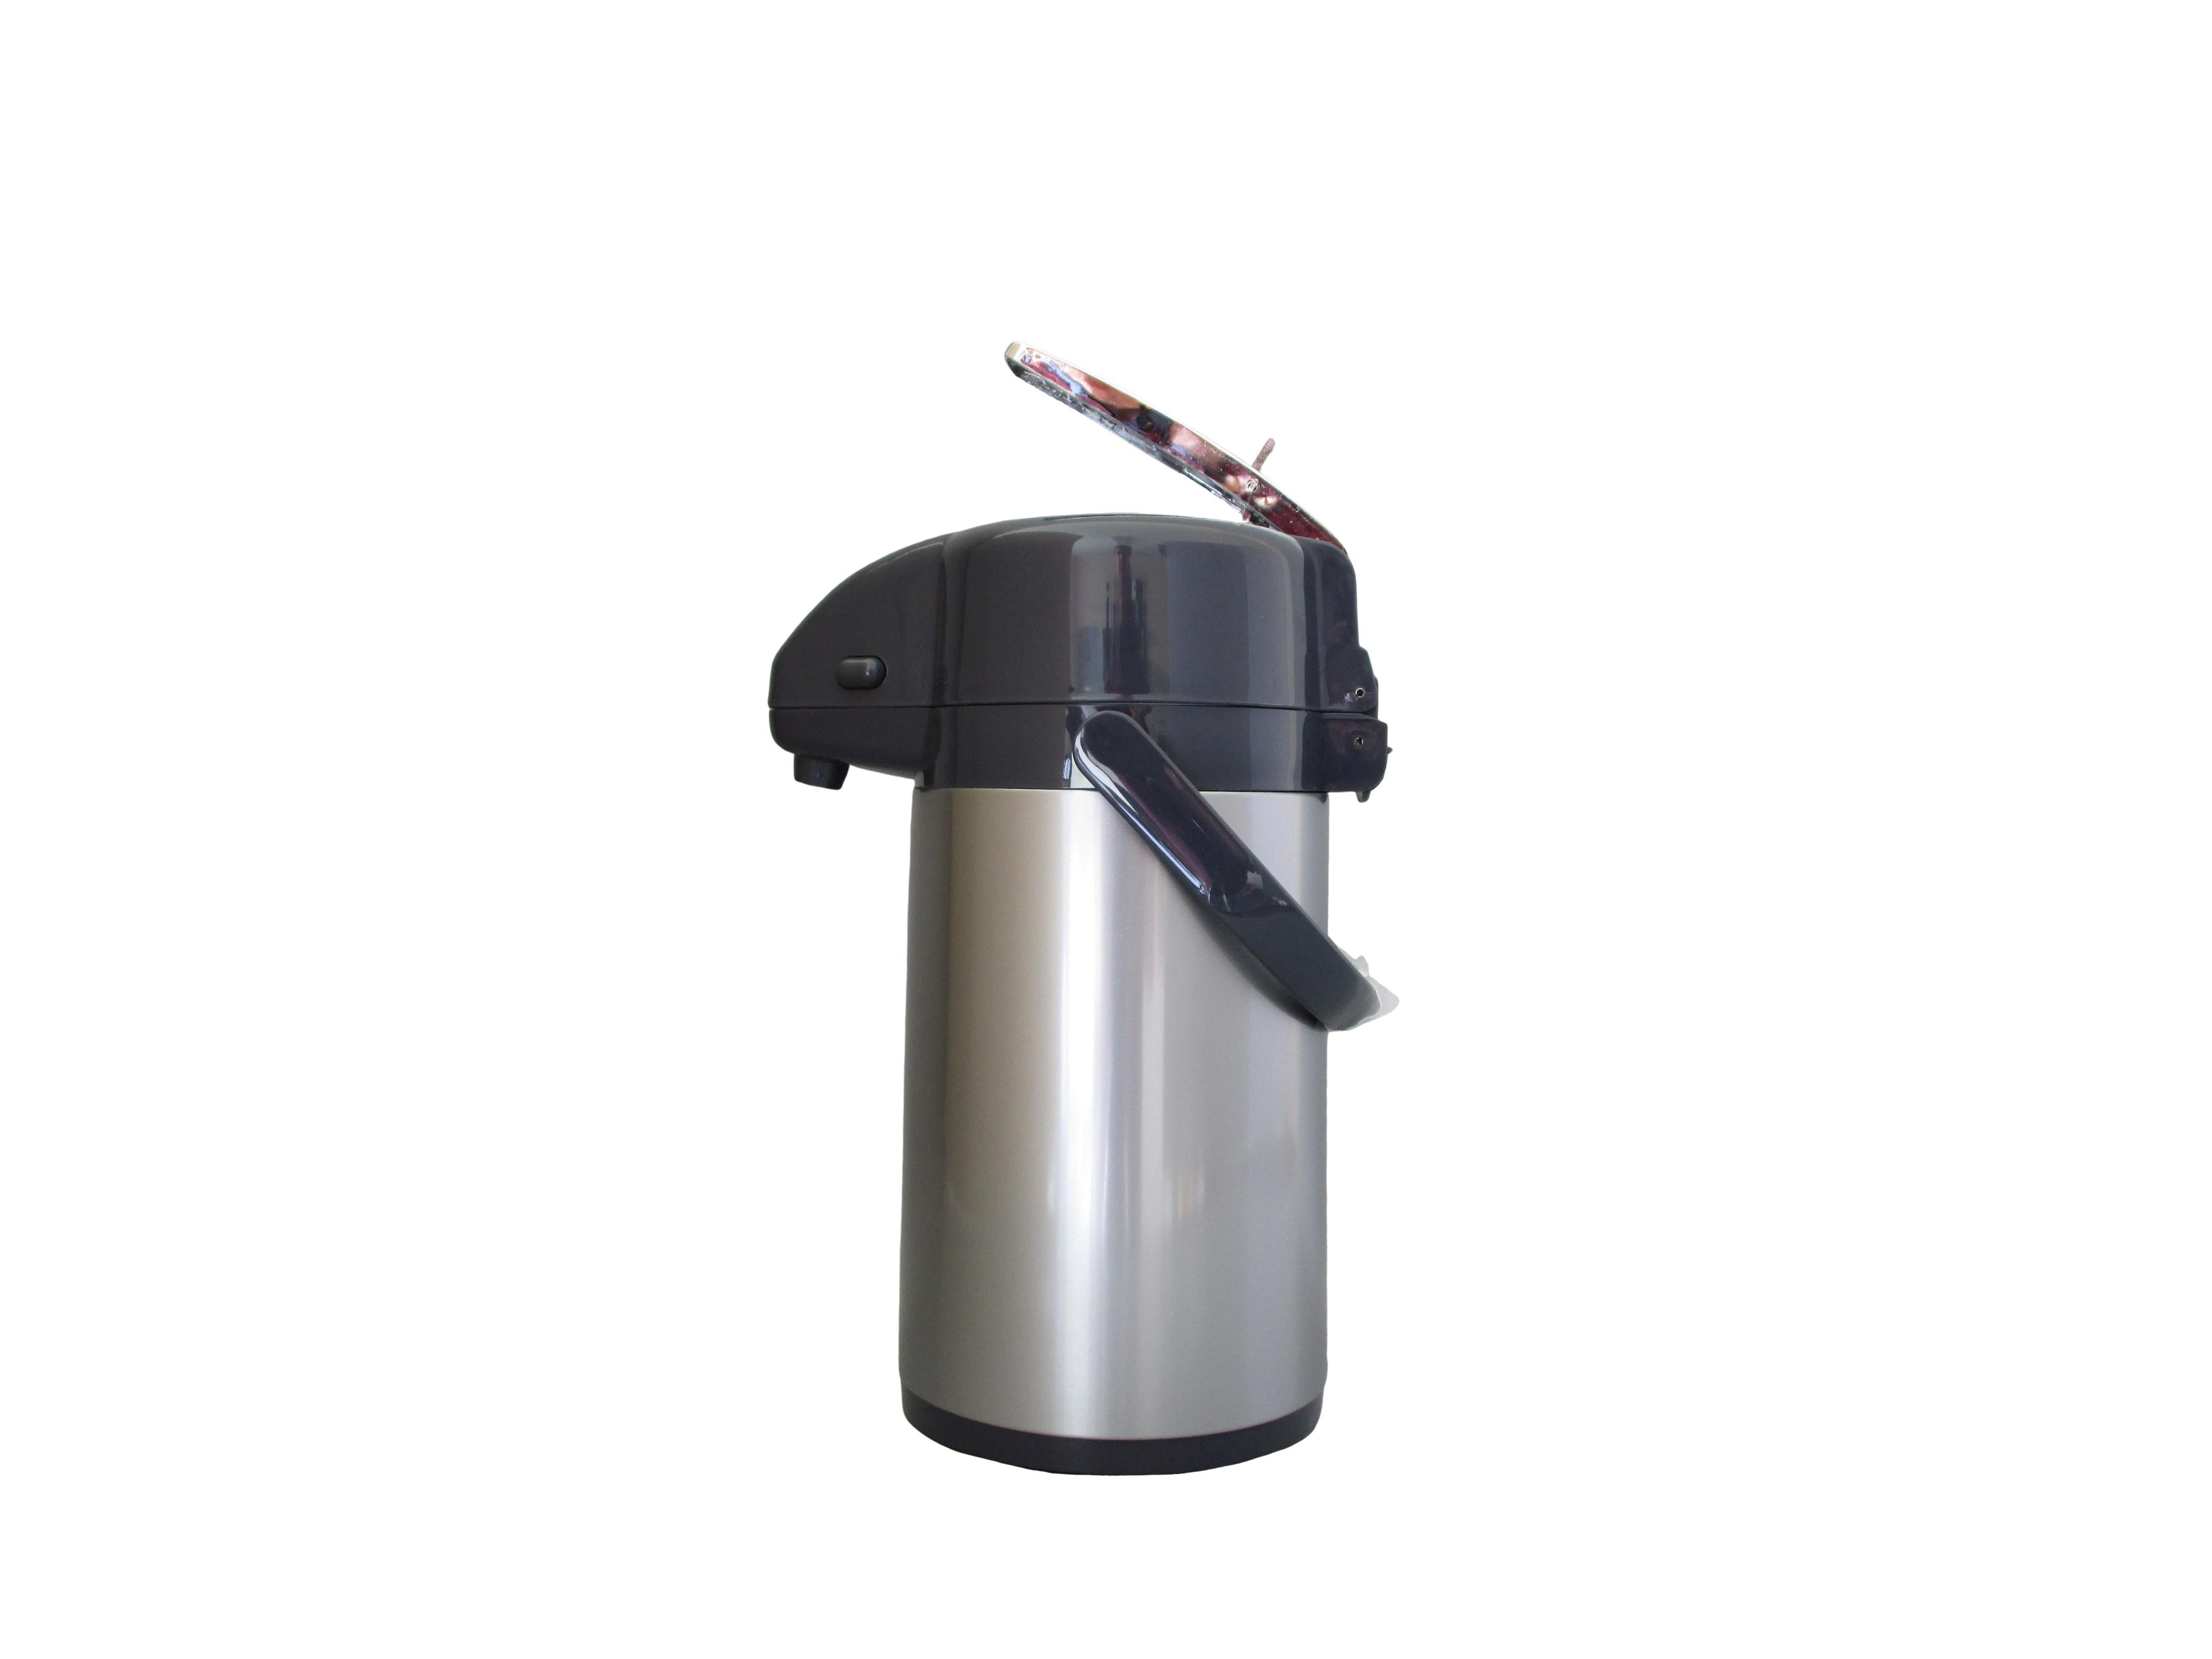 AYM13-040 - Pompkan metaal met pomphefboom taupe 1.3 L - Isobel